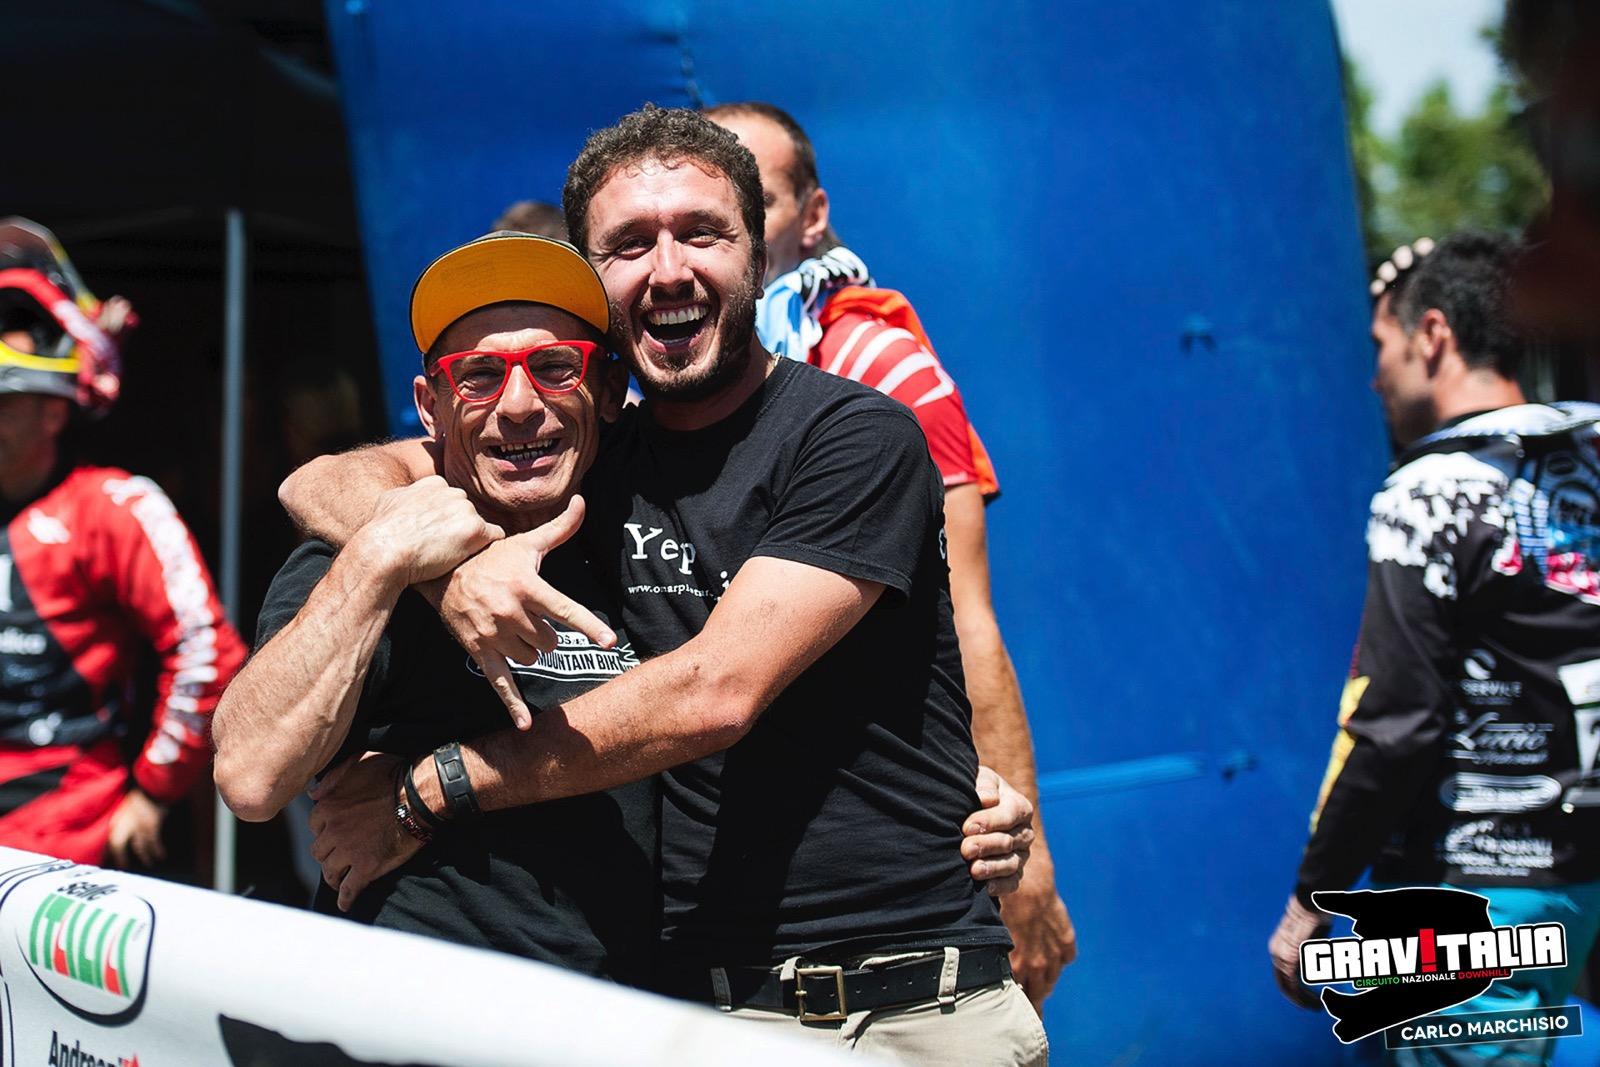 PhotoCarloMarchisio_GIT2015_CampionatiItaliani_Sestola_030